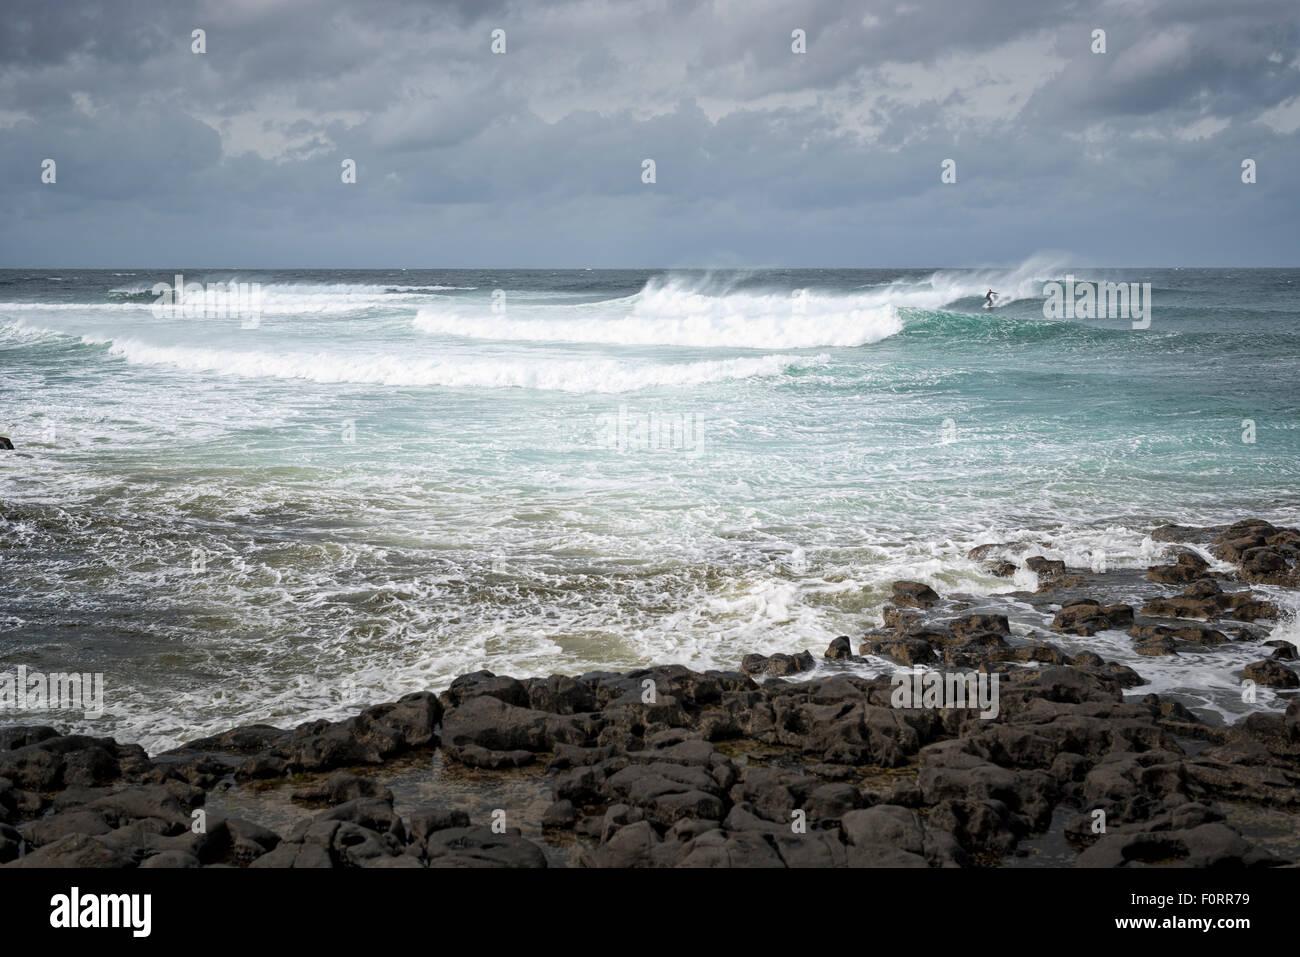 Suffer riding a wave in the Atlantic of the west coast of Ireland, Easky, Co. Sligo. - Stock Image